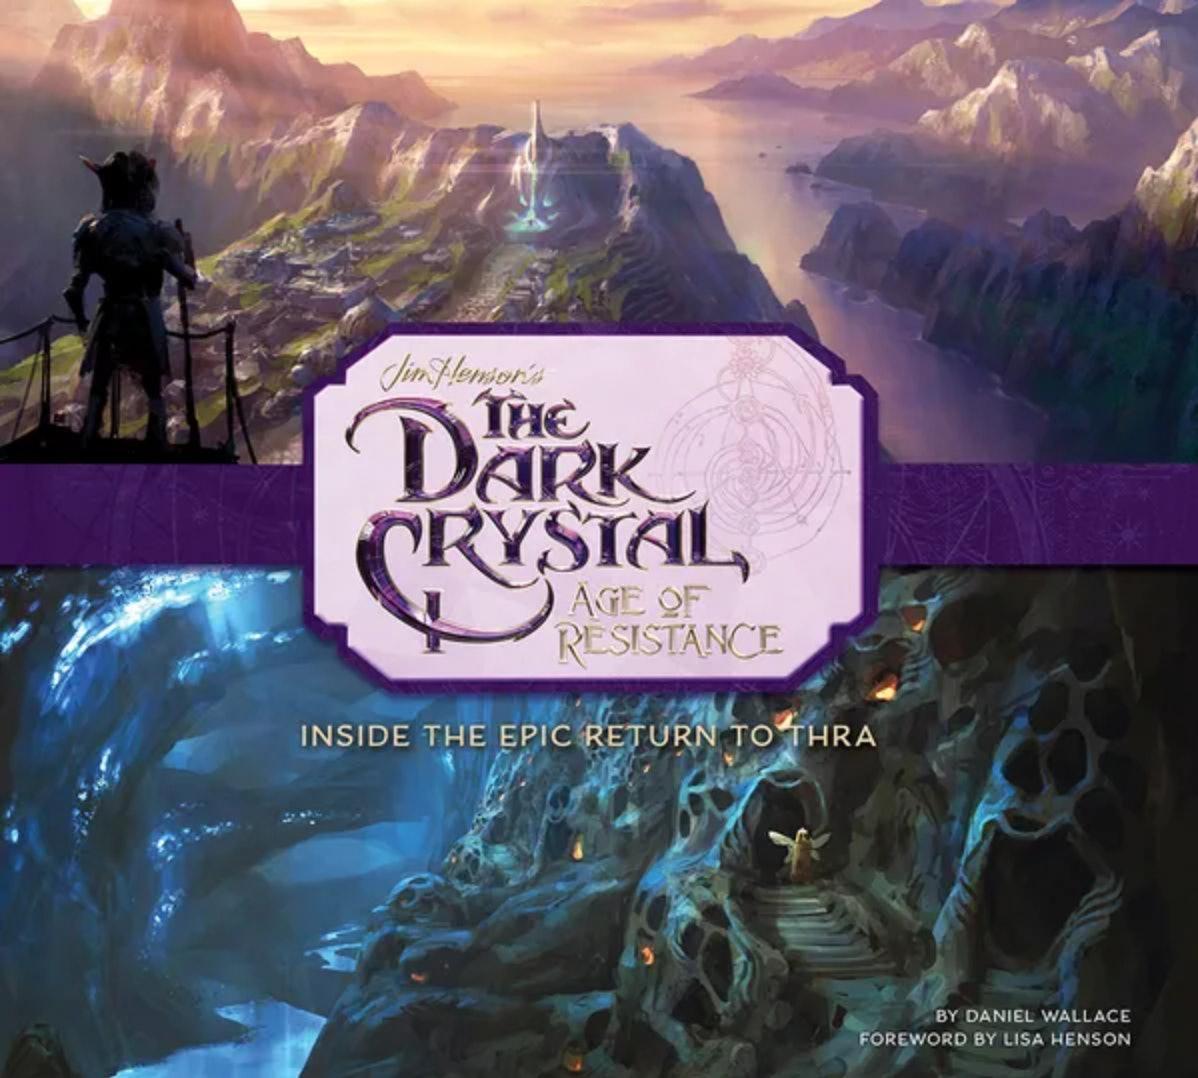 dark crystal age of resistance netflix book